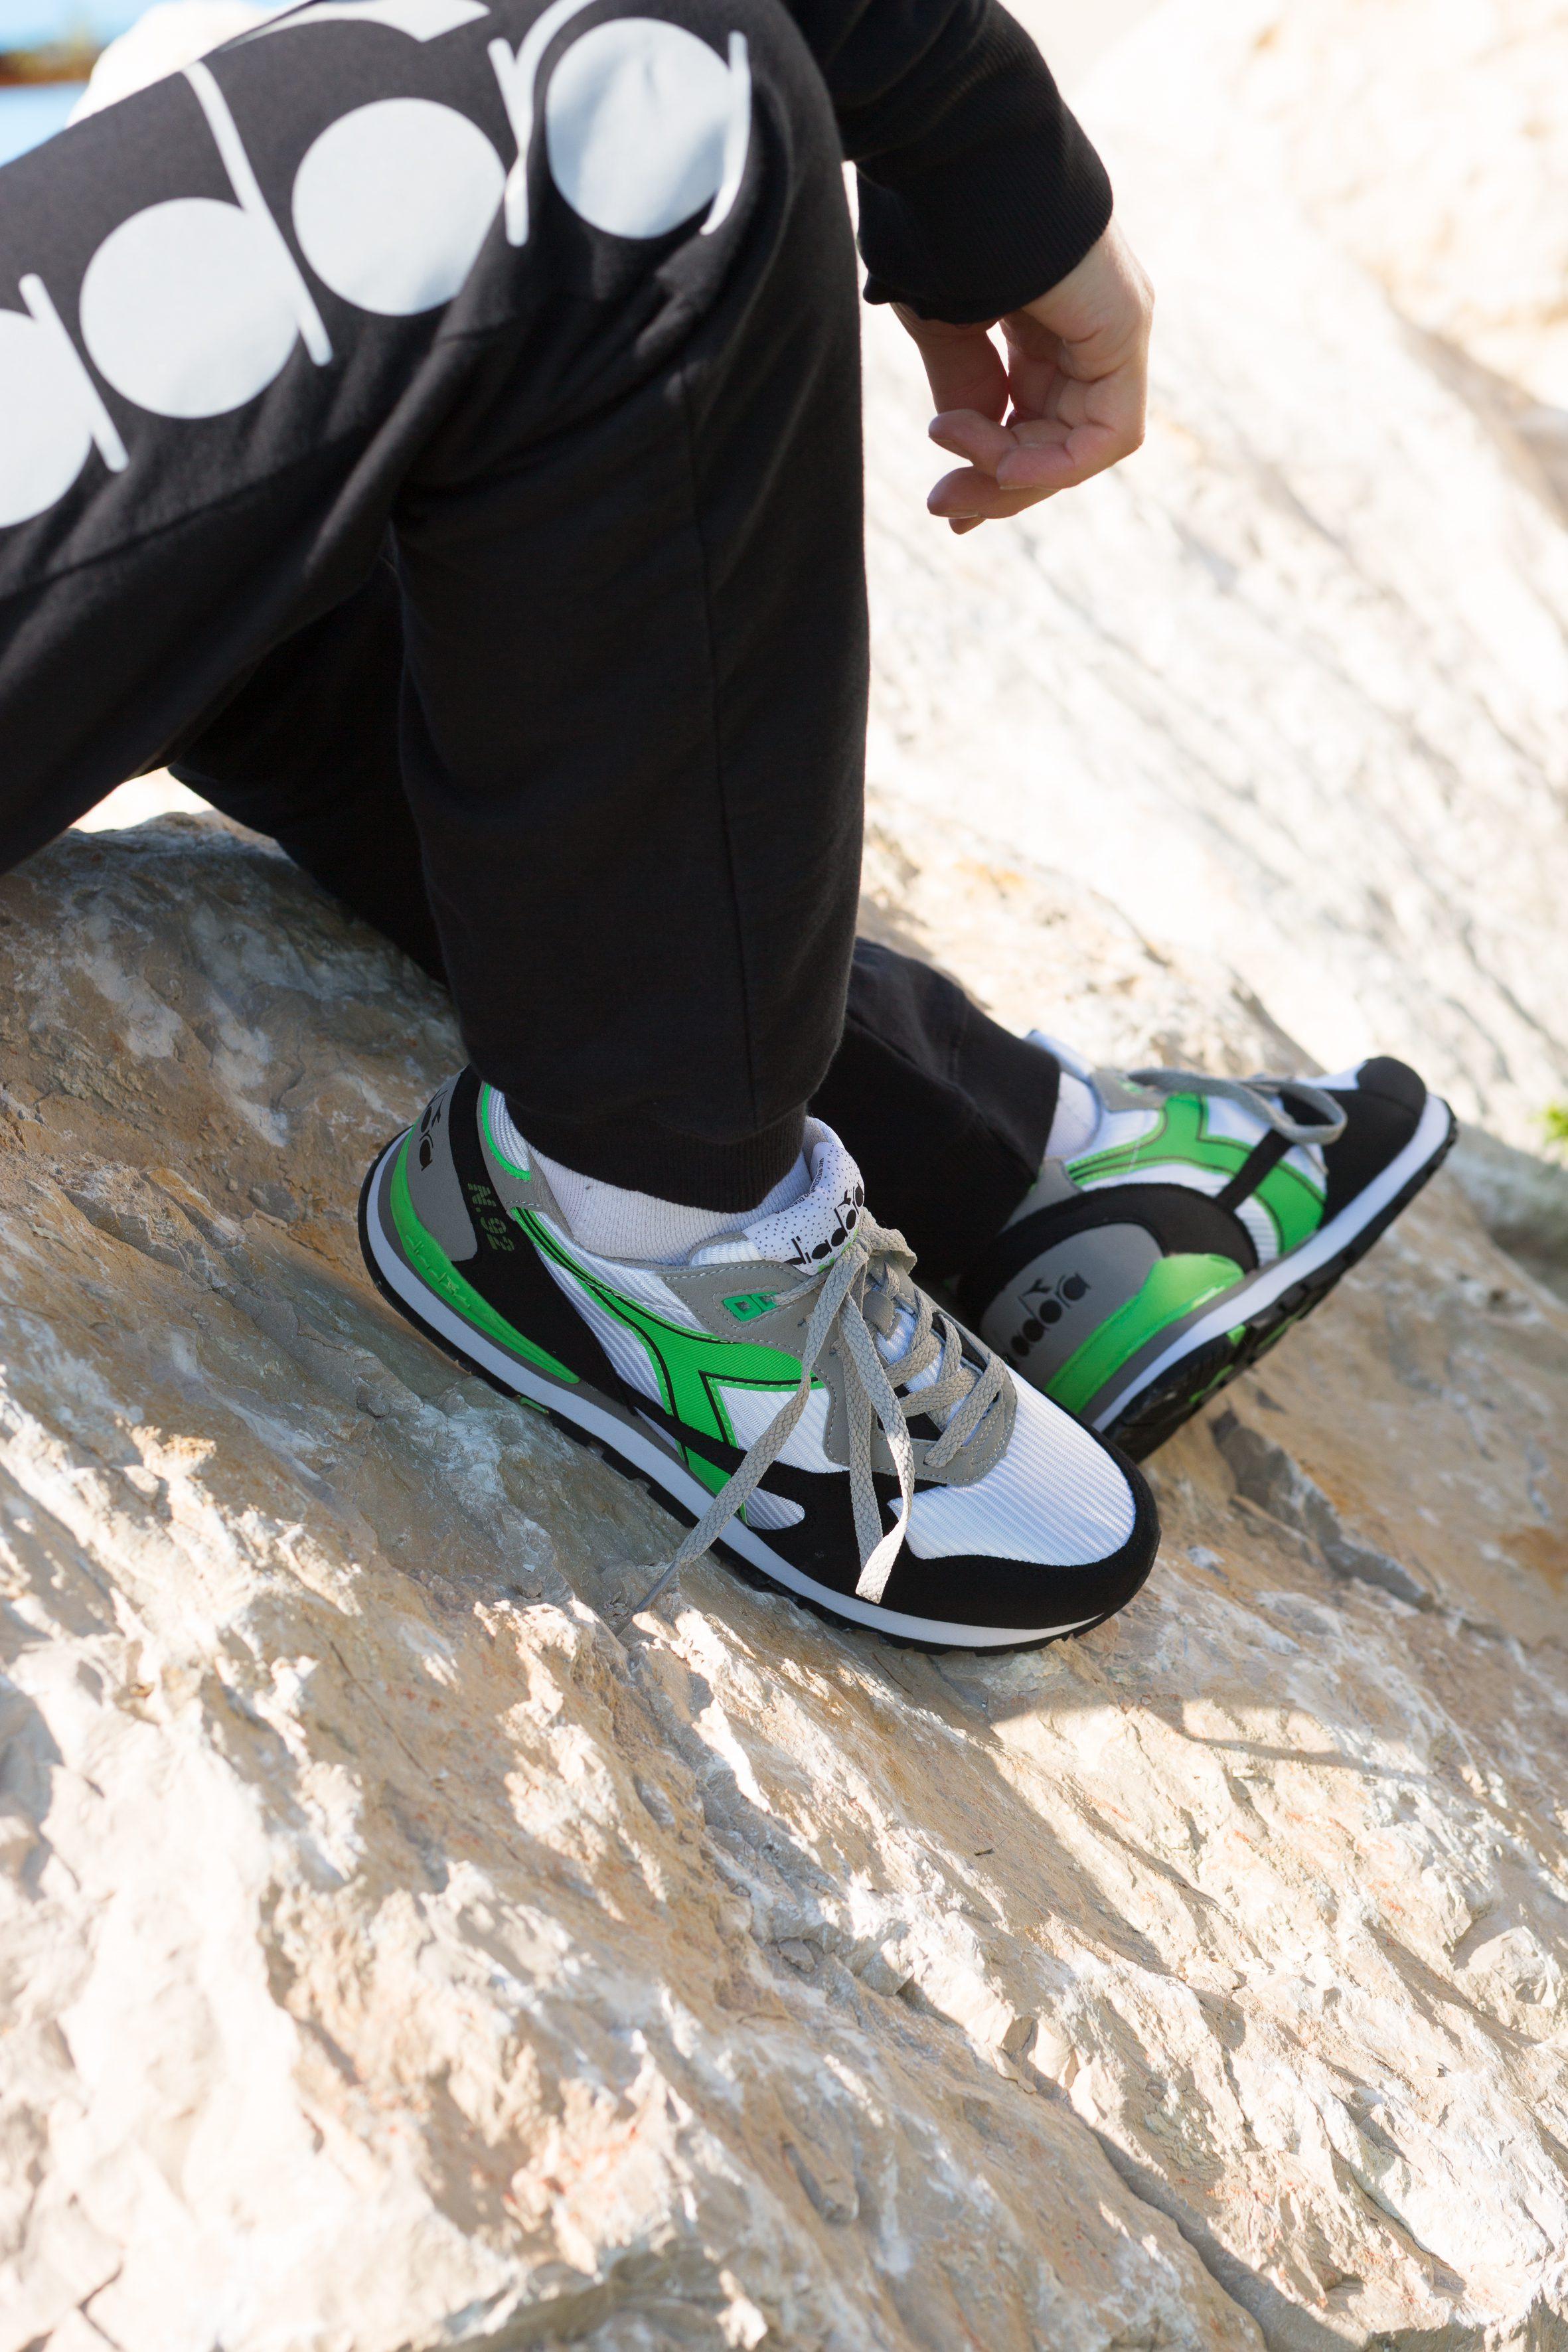 Dutch_Hero_Wouther_Weldman_Sportswear_with N92 shoes _1.jpg